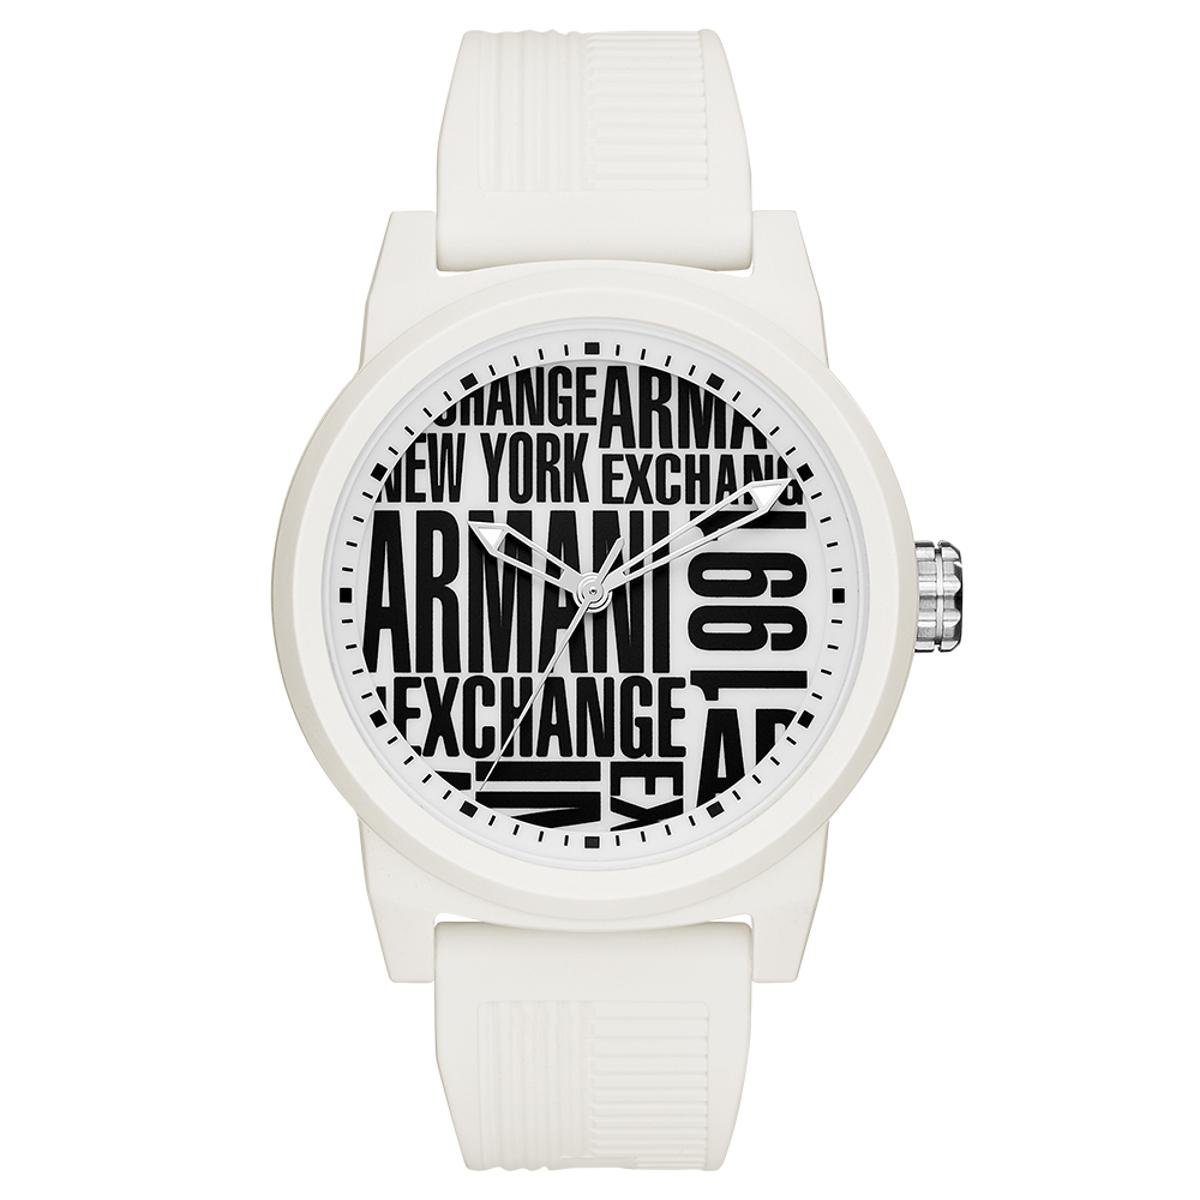 941b2a7e433 Relógio Armani Exchange Masculino Atlc - AX1442 8BN AX1442 8BN - Branco -  Compre Agora